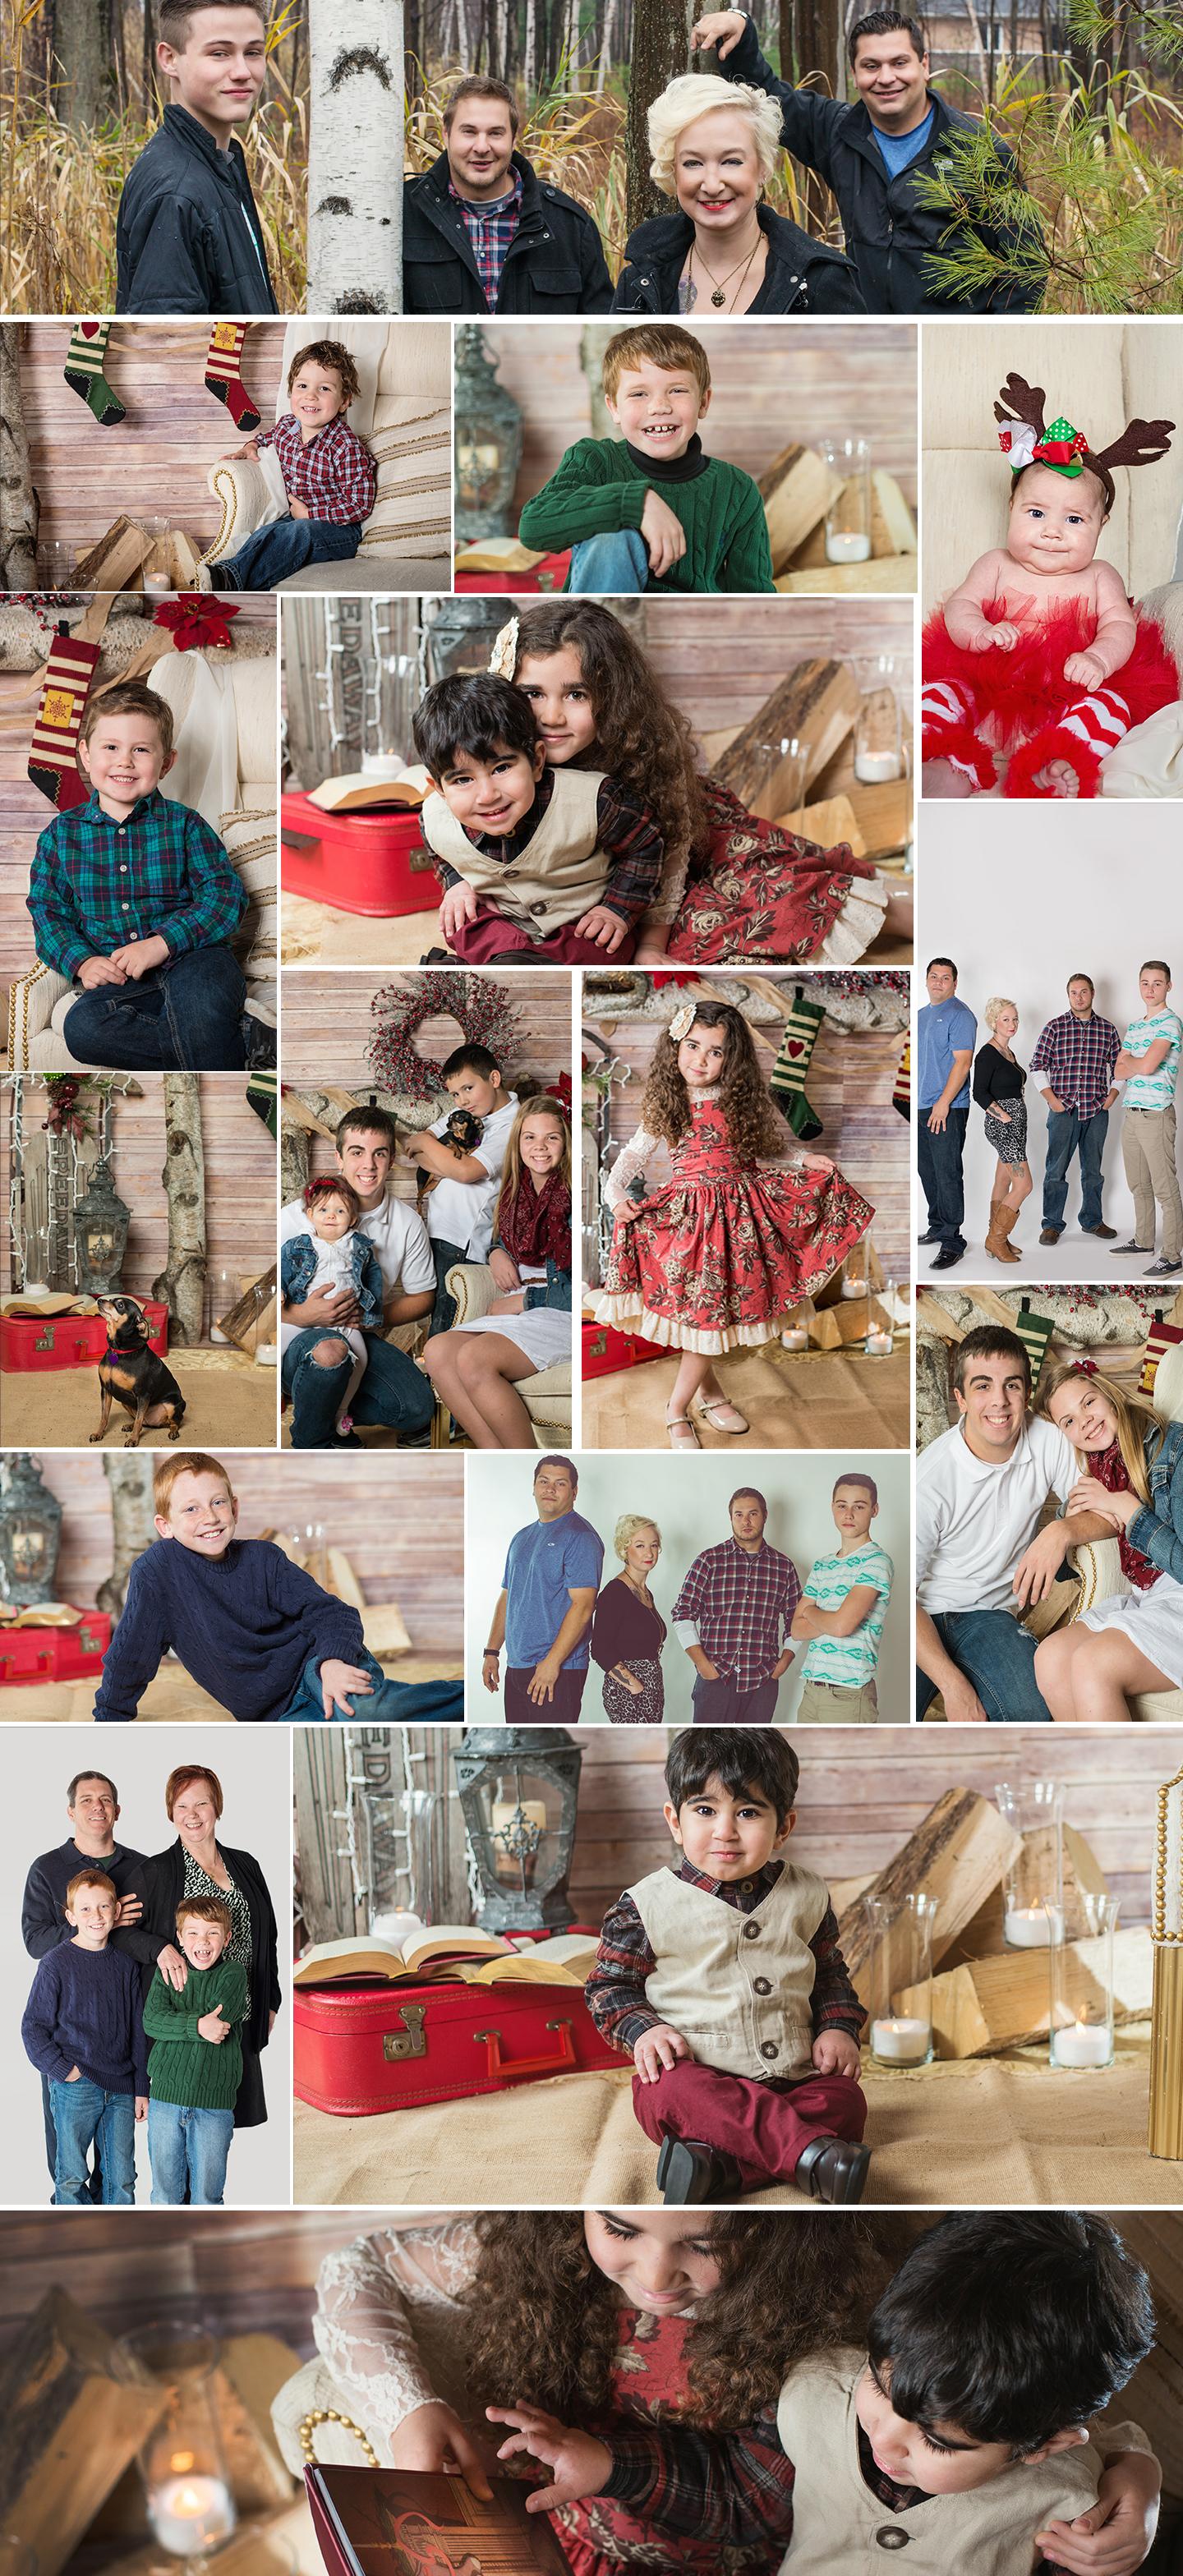 ajbcphotography-porthuron-michigan-photgrapher-christmas-holiday-season-winter-kids-family-dogs.jpg